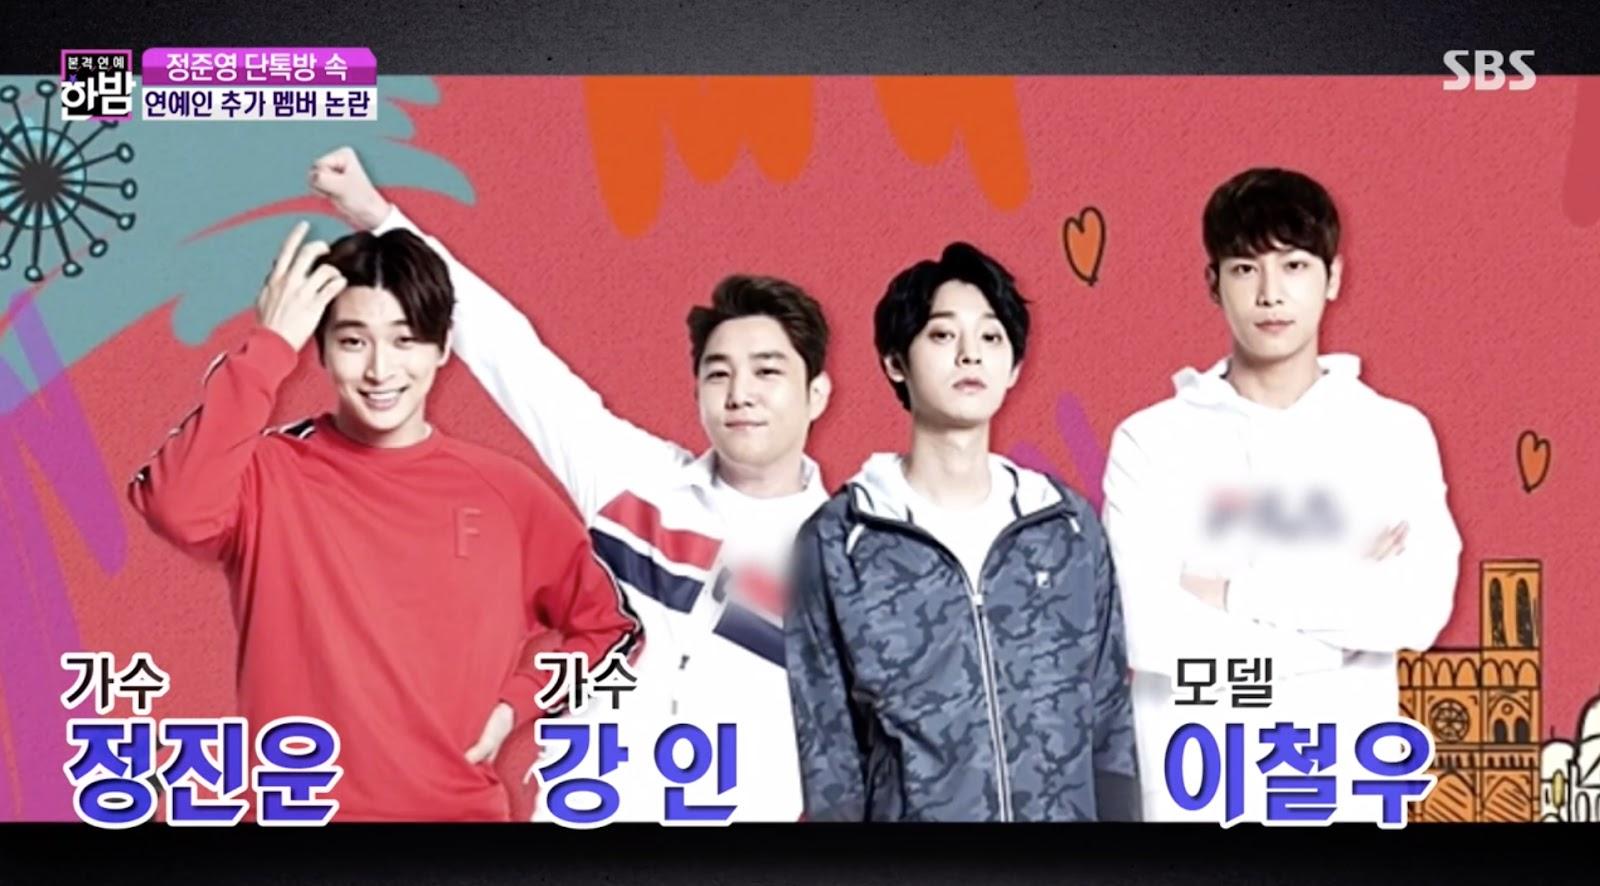 jung joon young chat 1